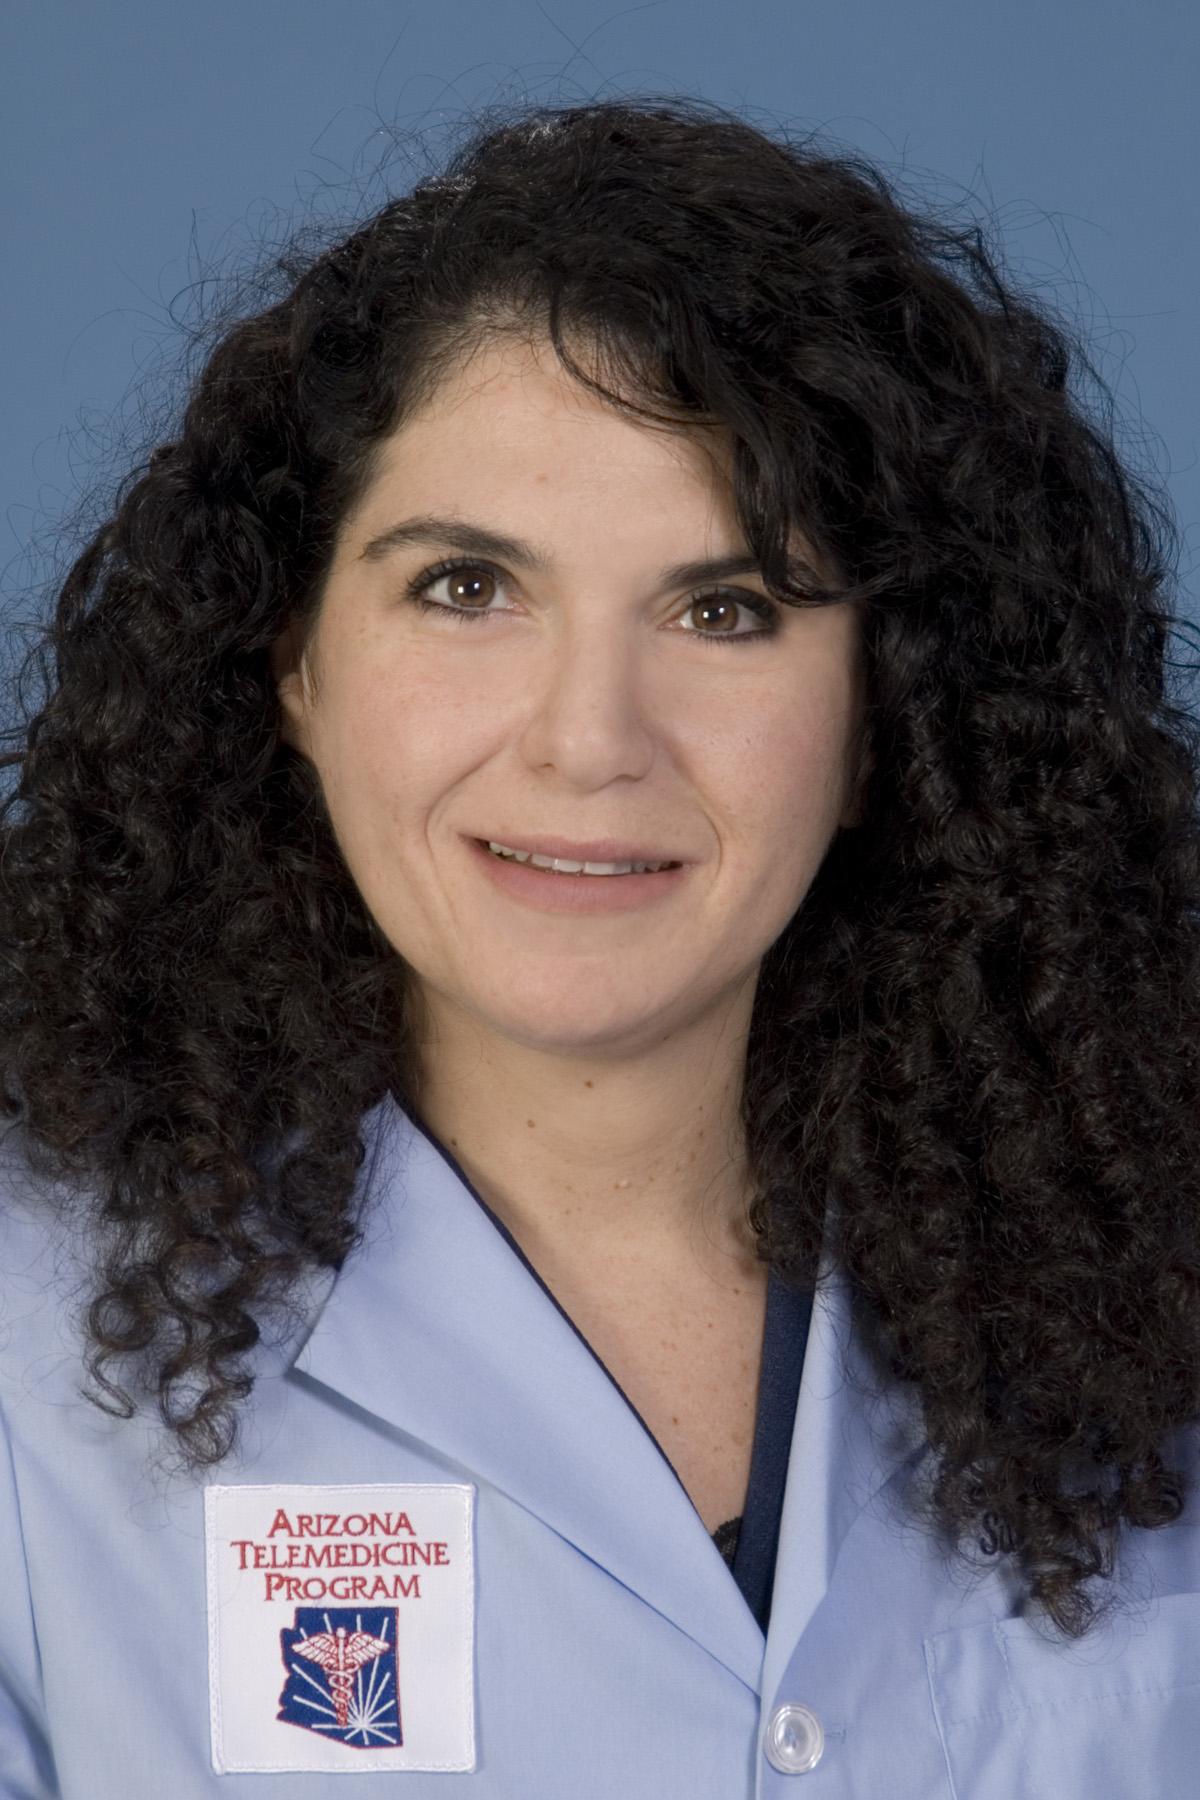 Public Health Service Approves Sisley's PTSD Study